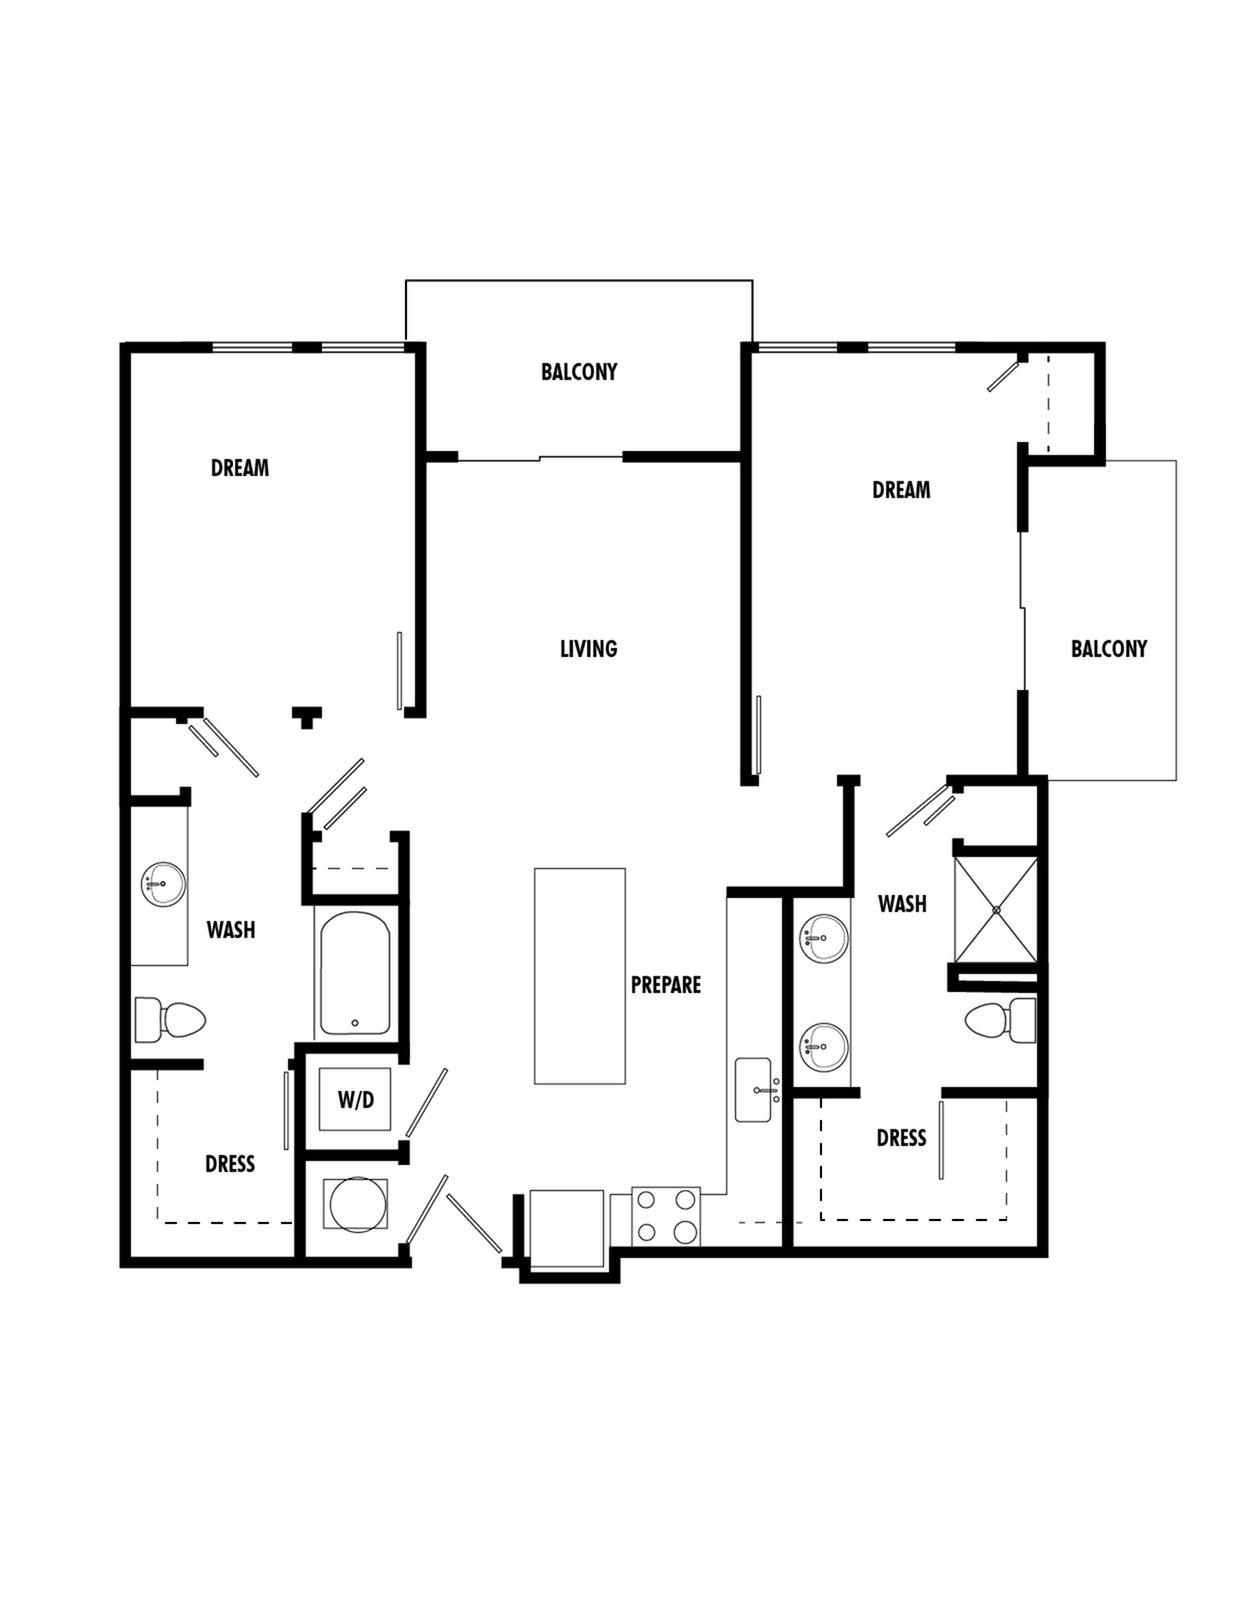 B03 Floor Plan